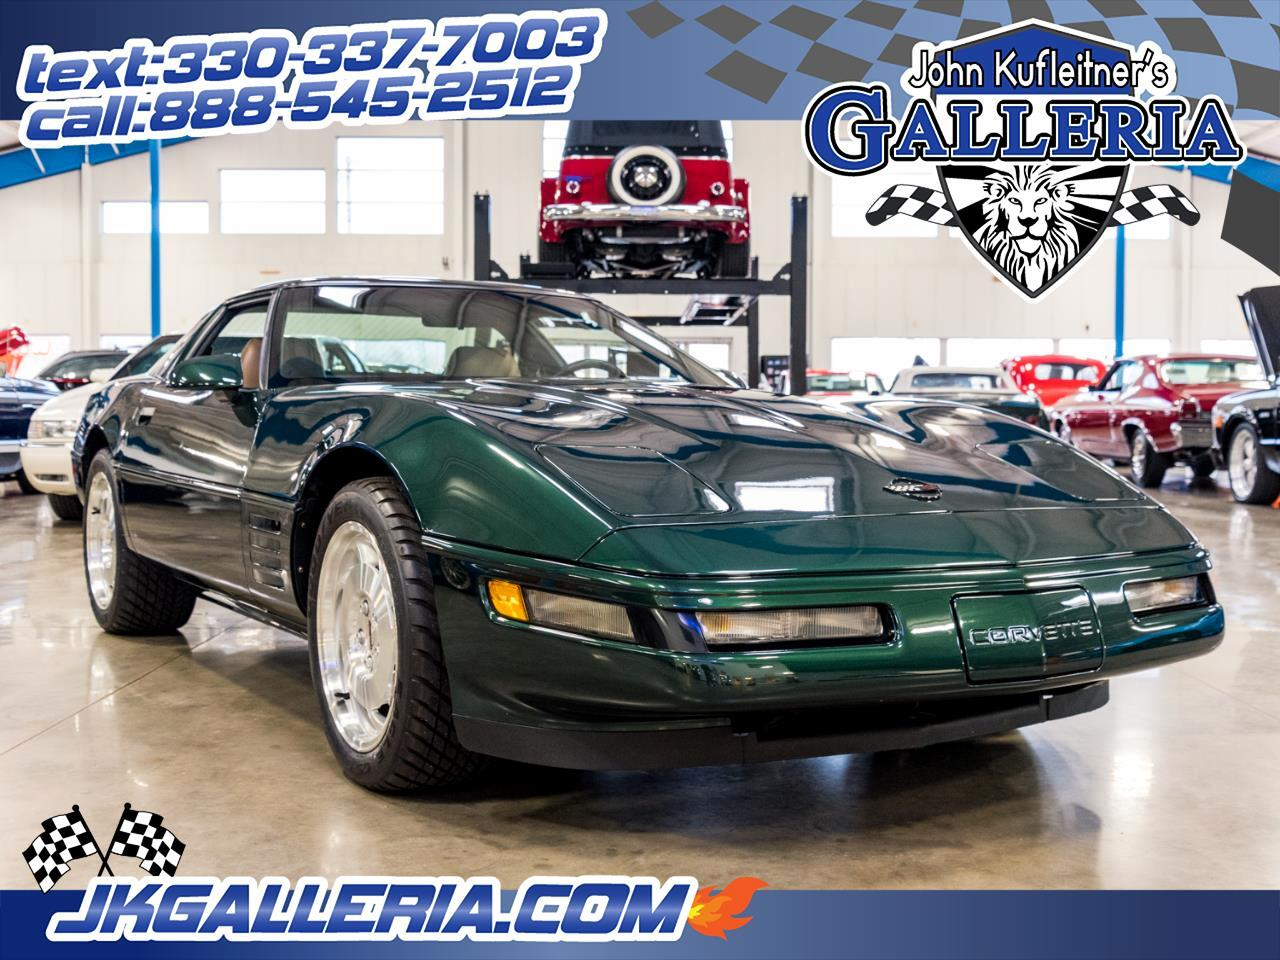 Chevrolet Corvette 2dr Coupe Hatchback 1994